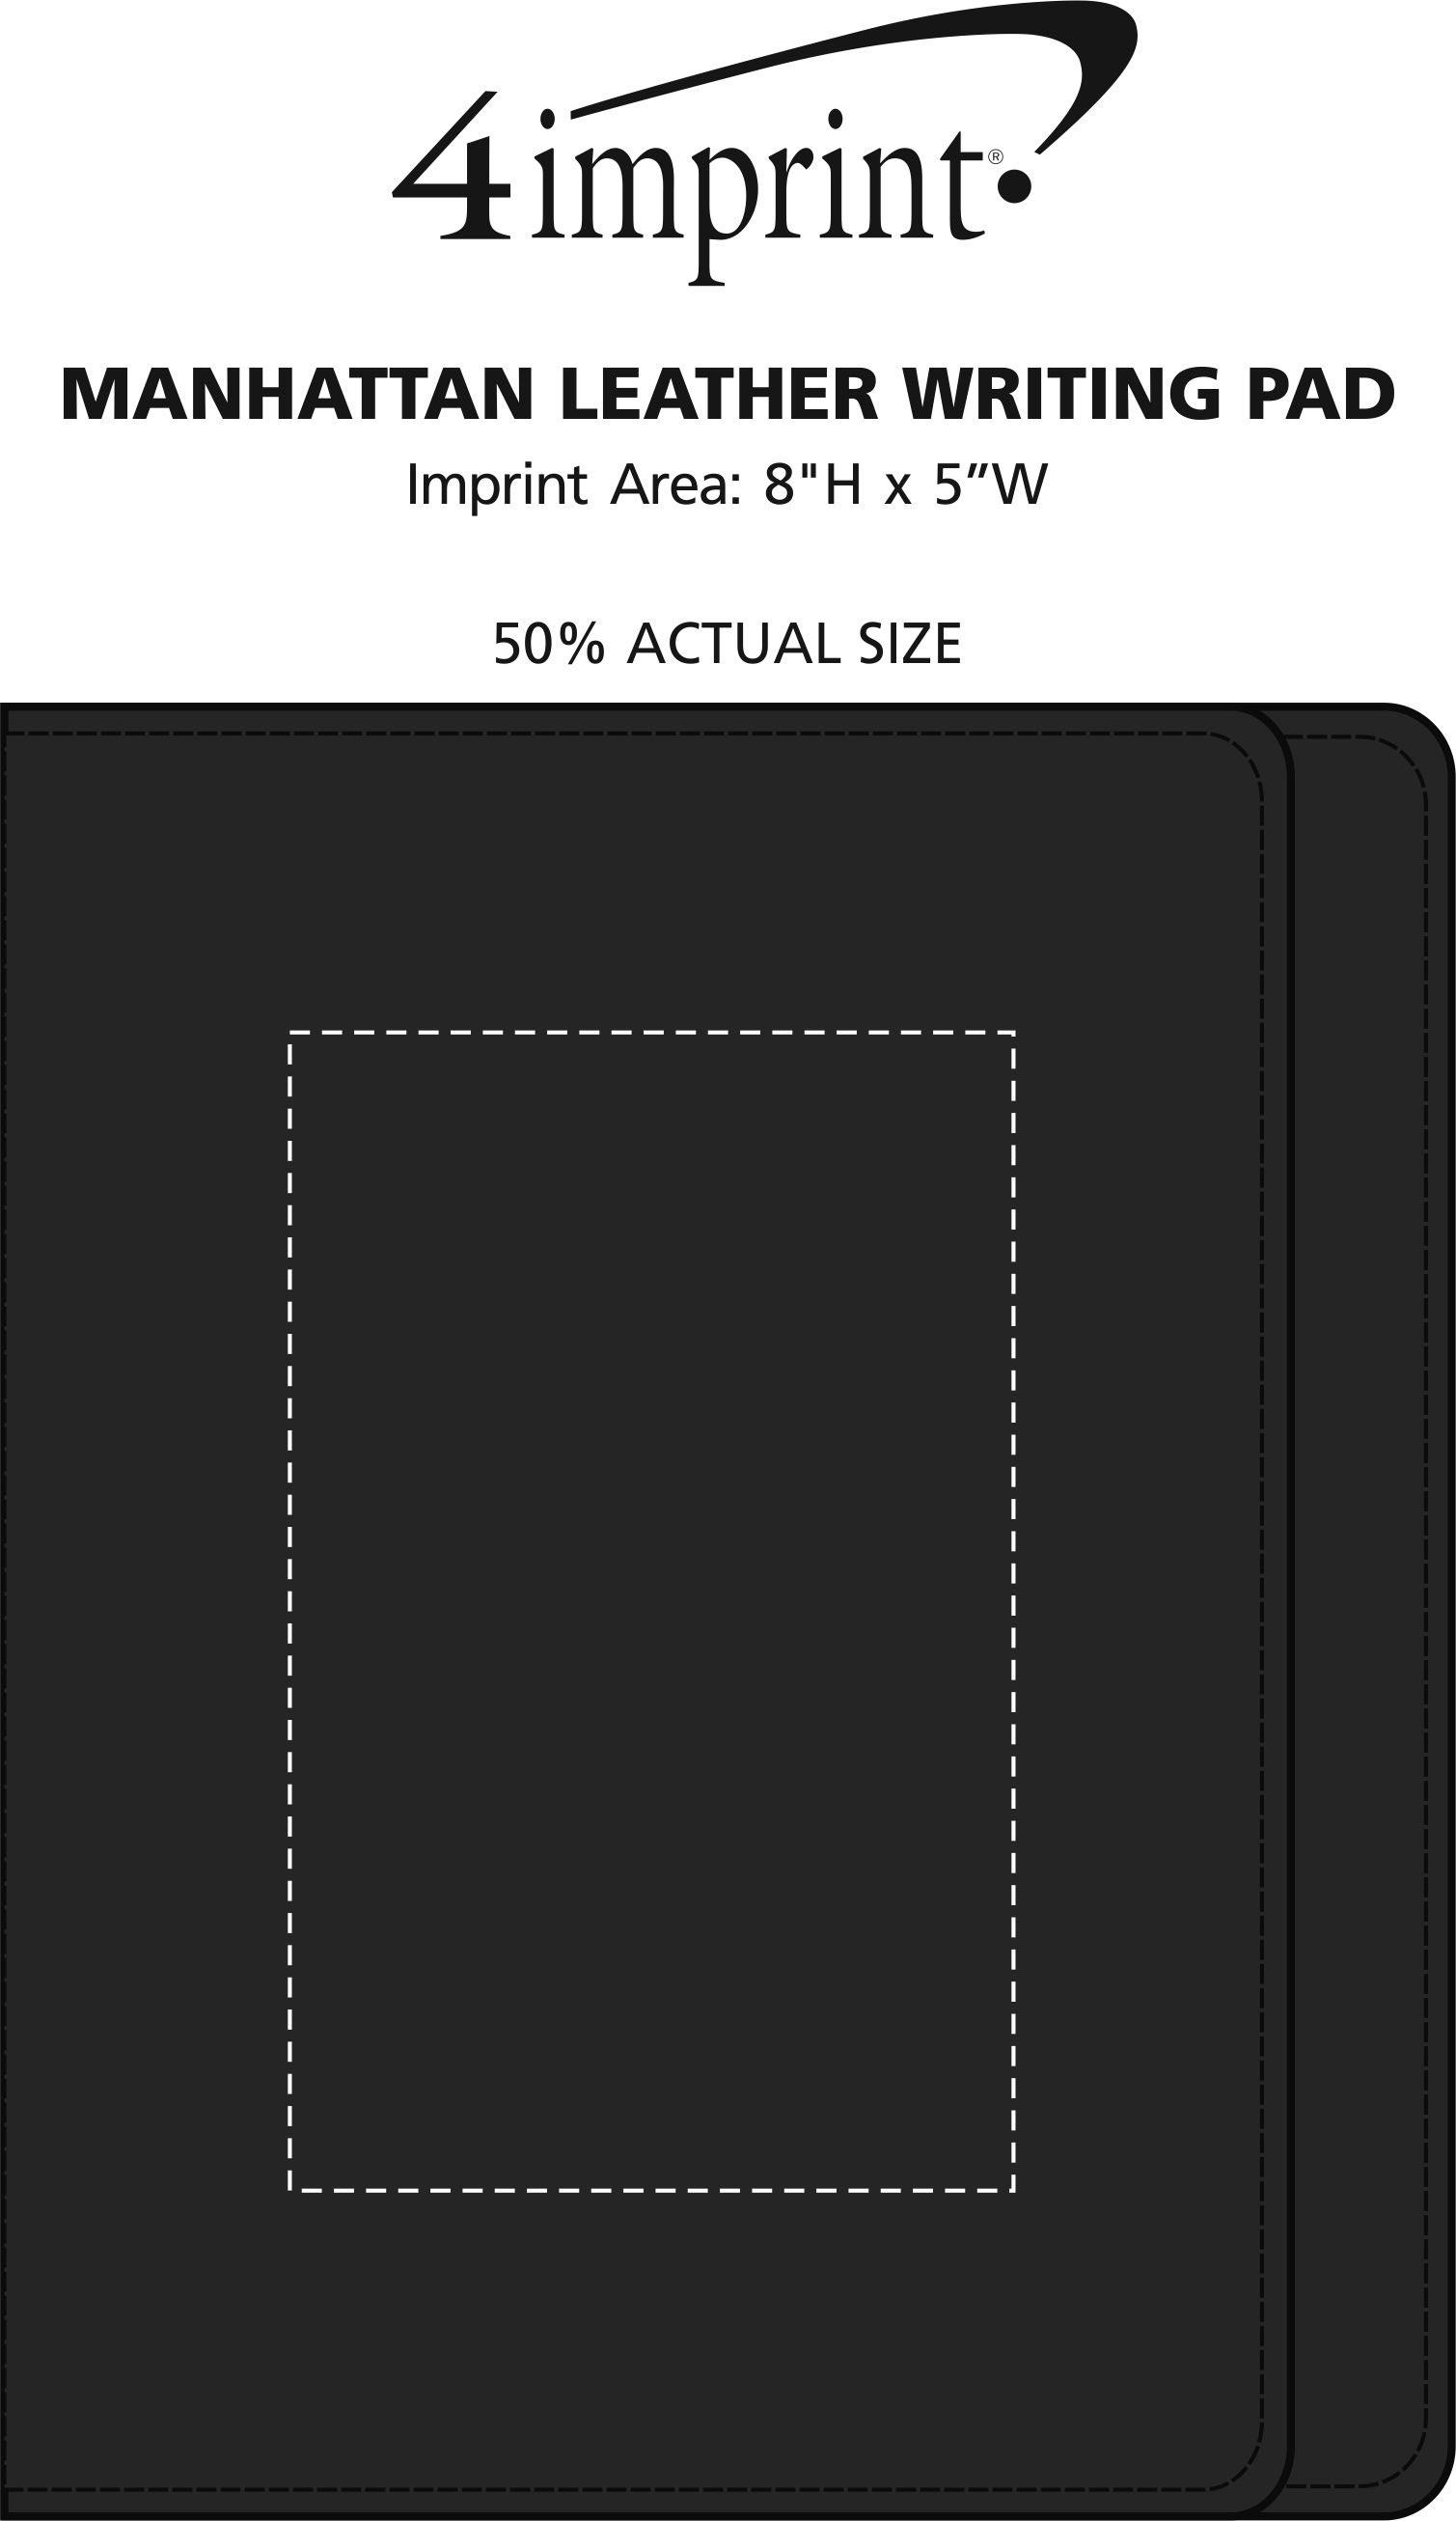 Imprint Area of Manhattan Leather Writing Pad